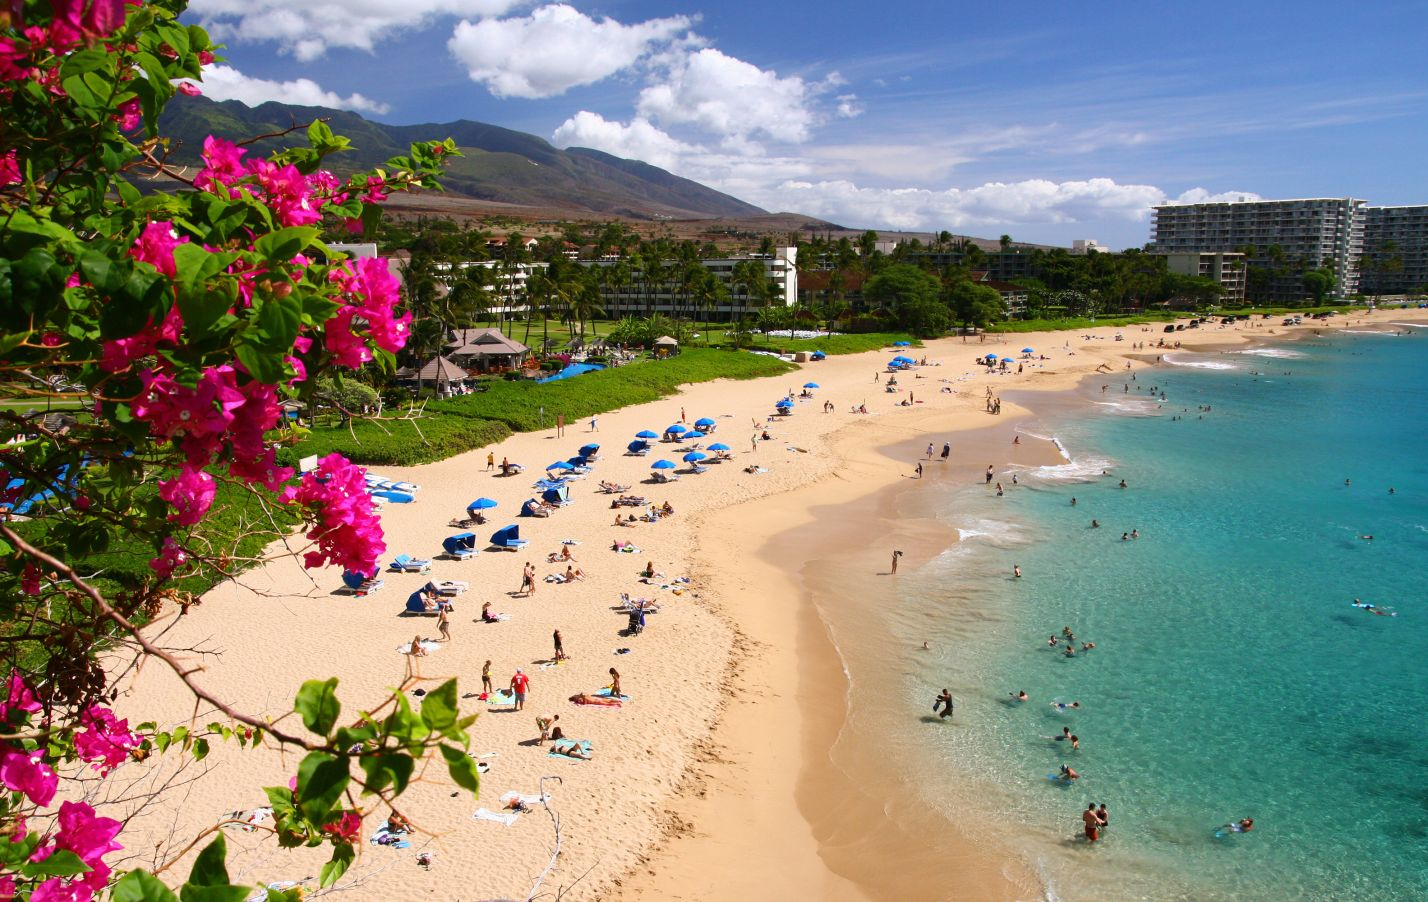 The Stunning Beaches Of Maui